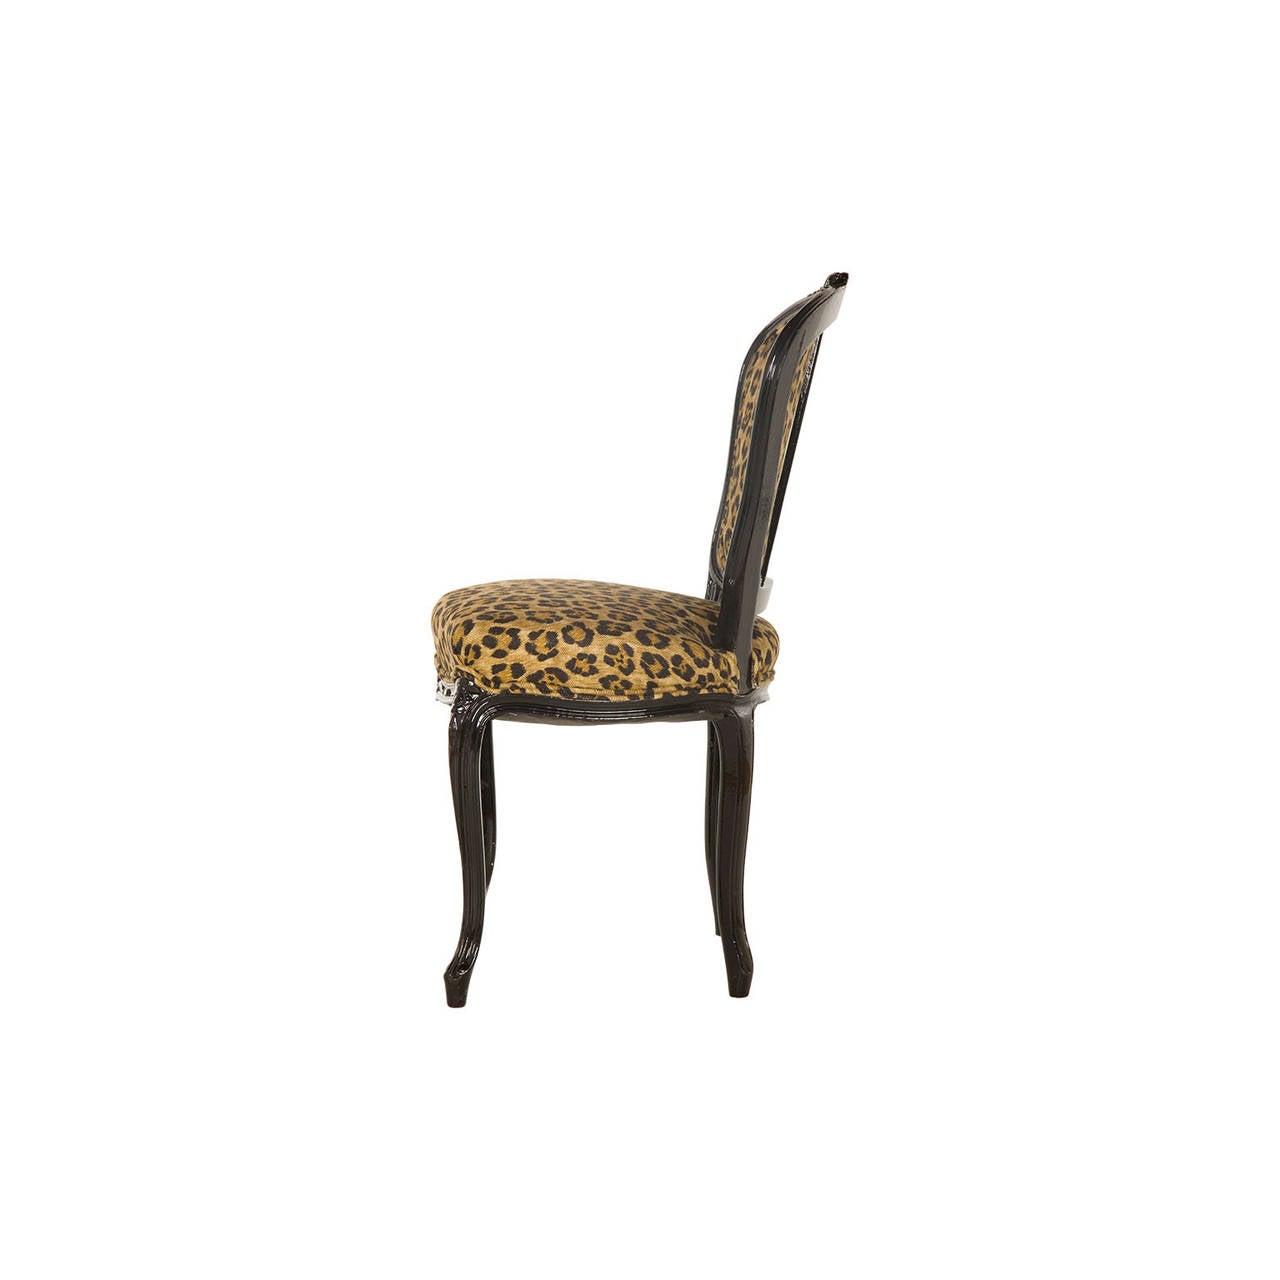 Vintage Leopard Print Cafe Chair at 1stdibs